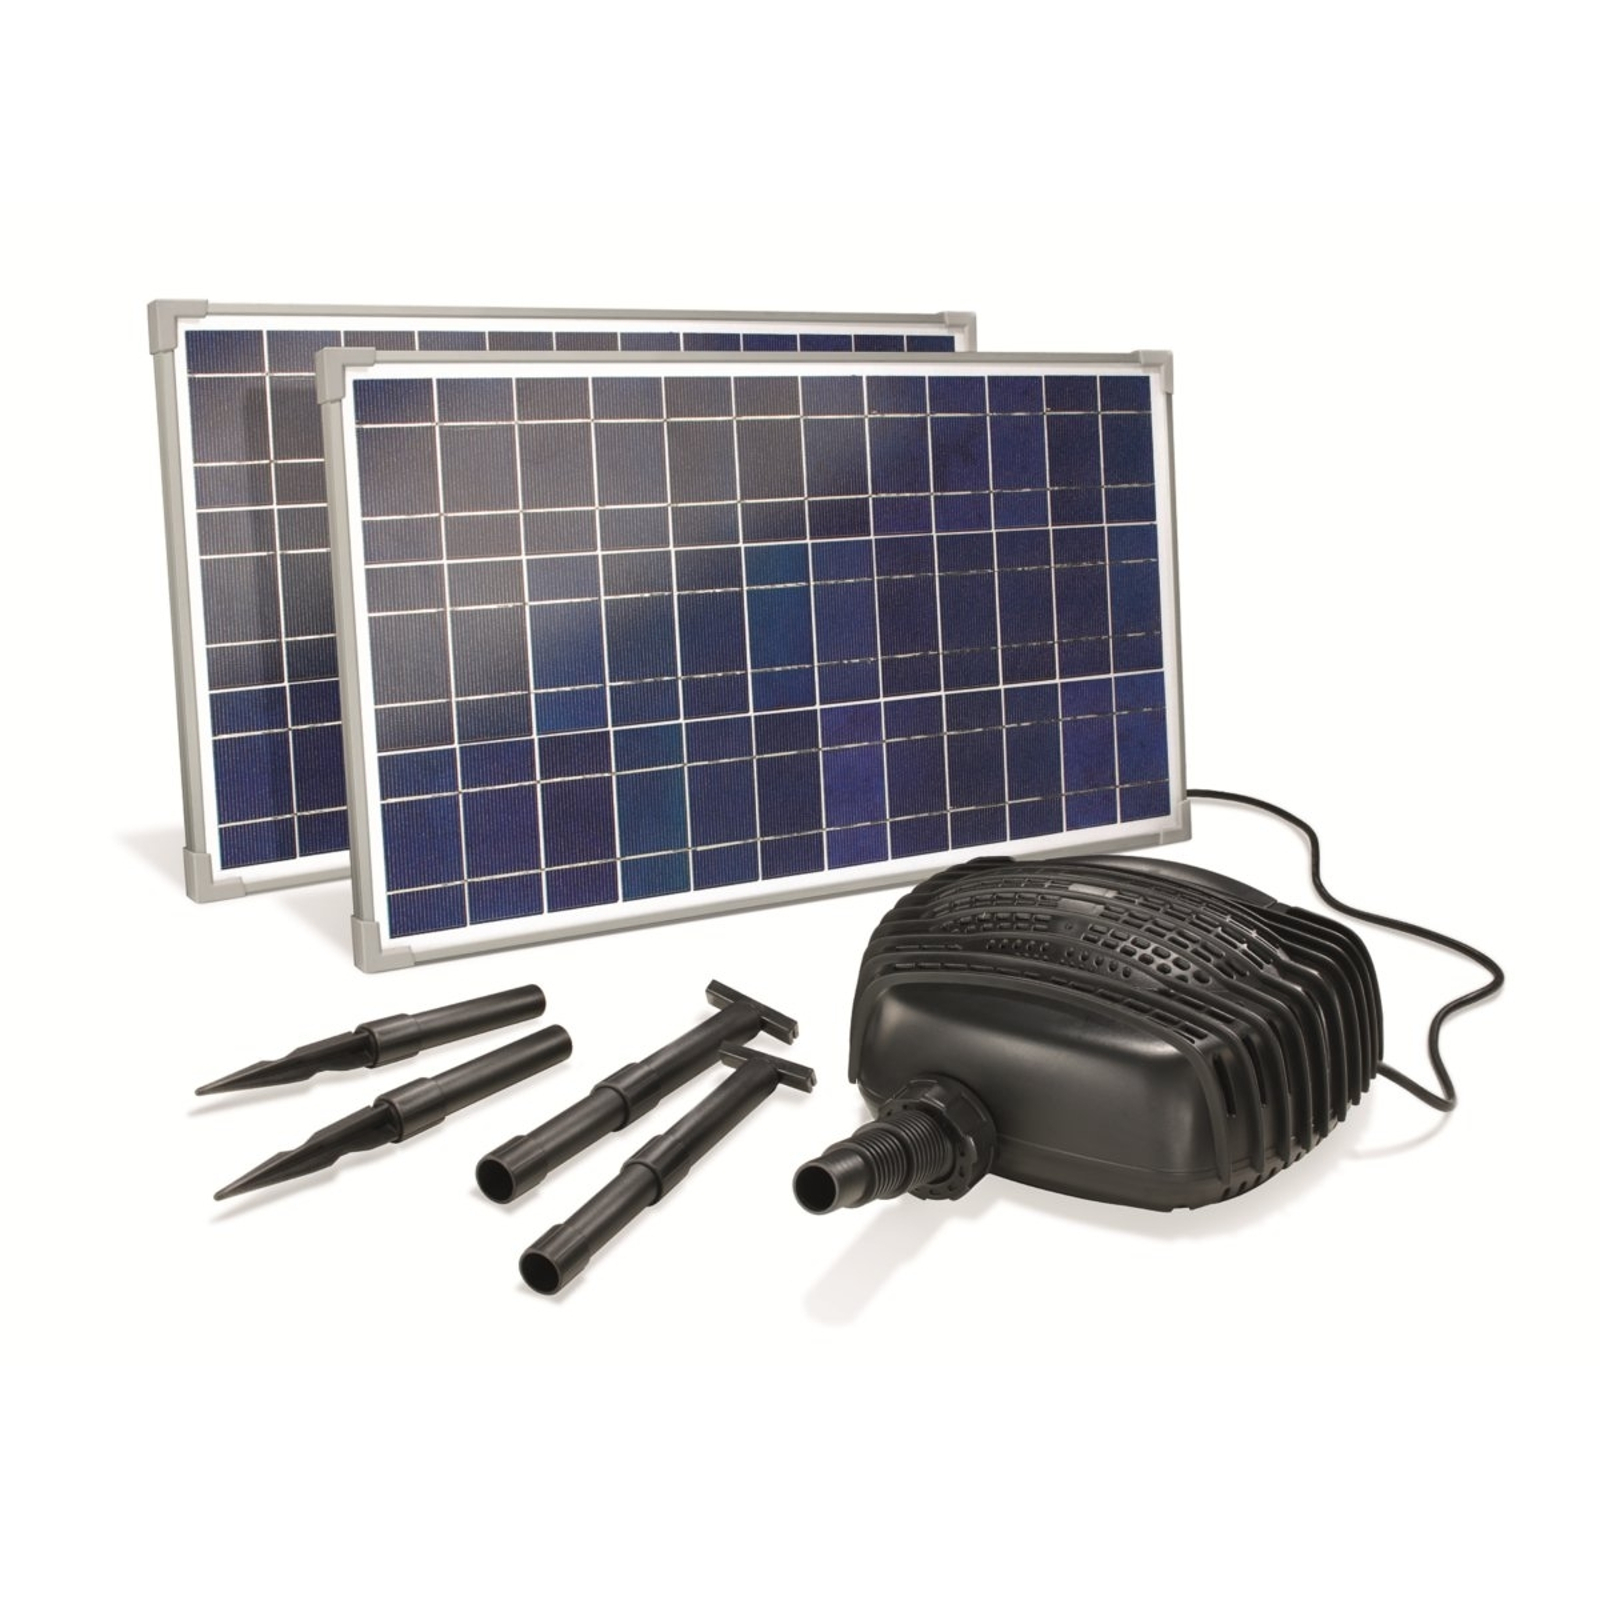 Adria solarpumpsystem